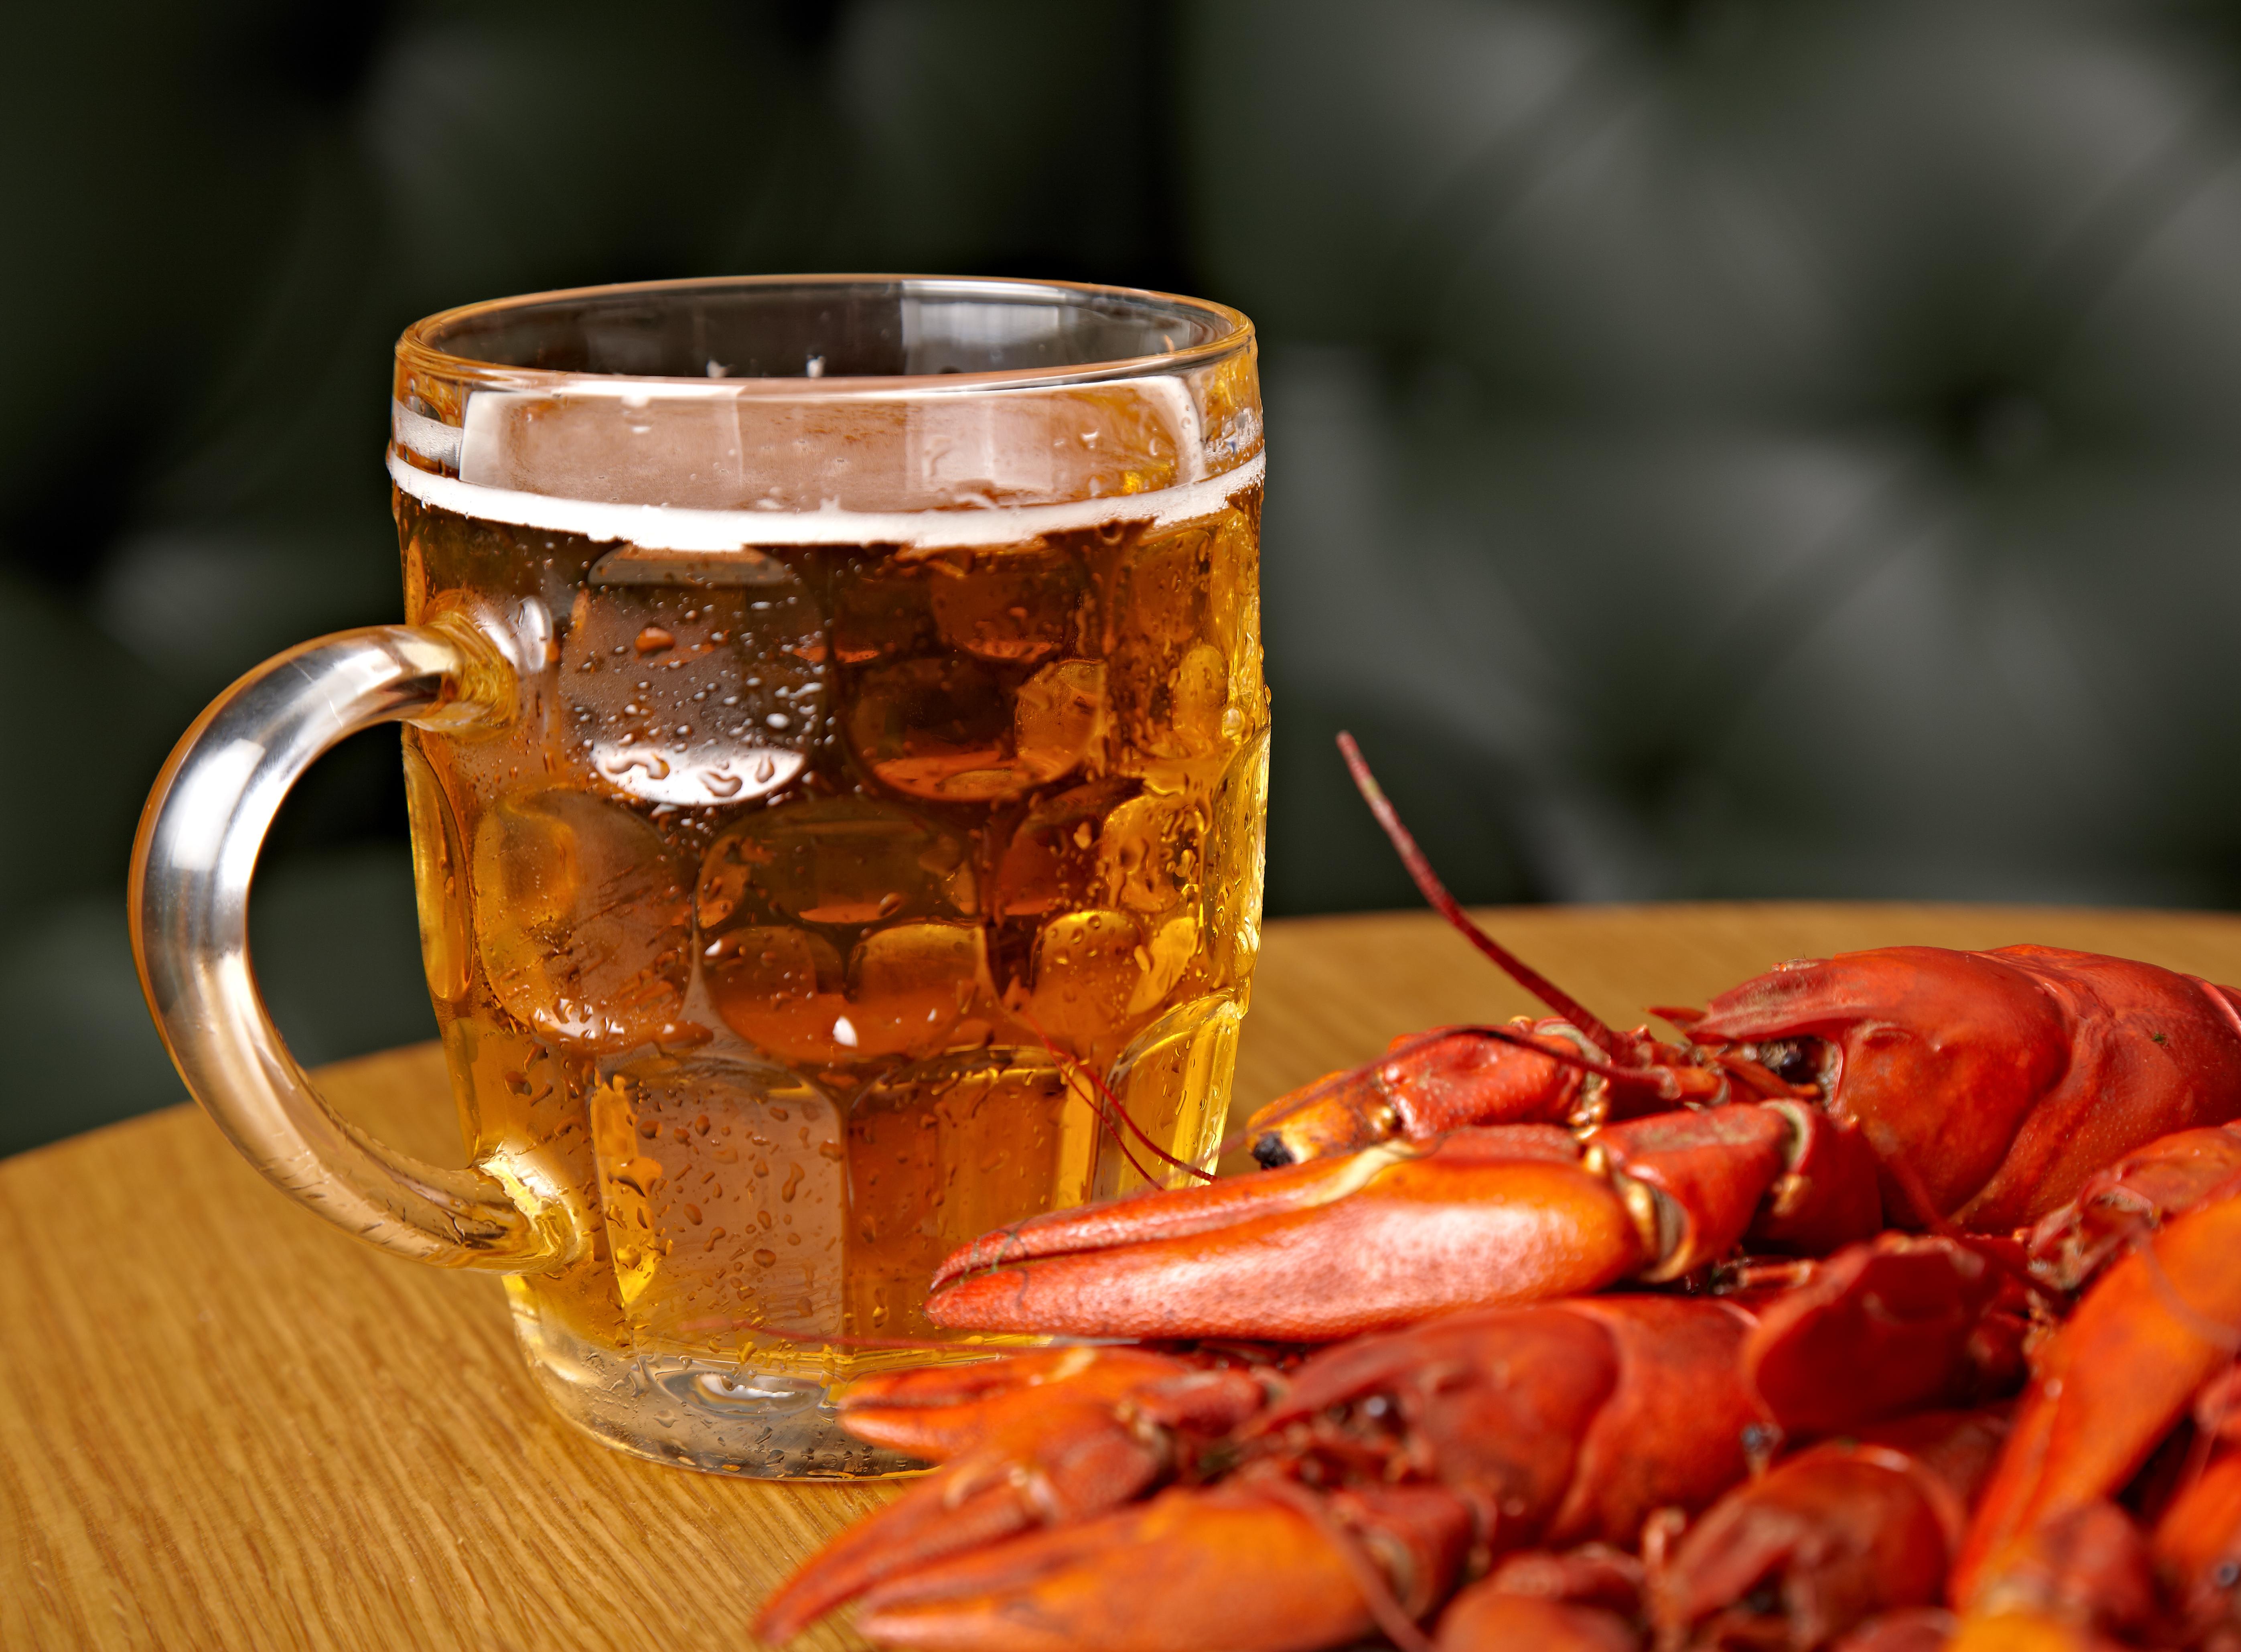 Crayfish with beer